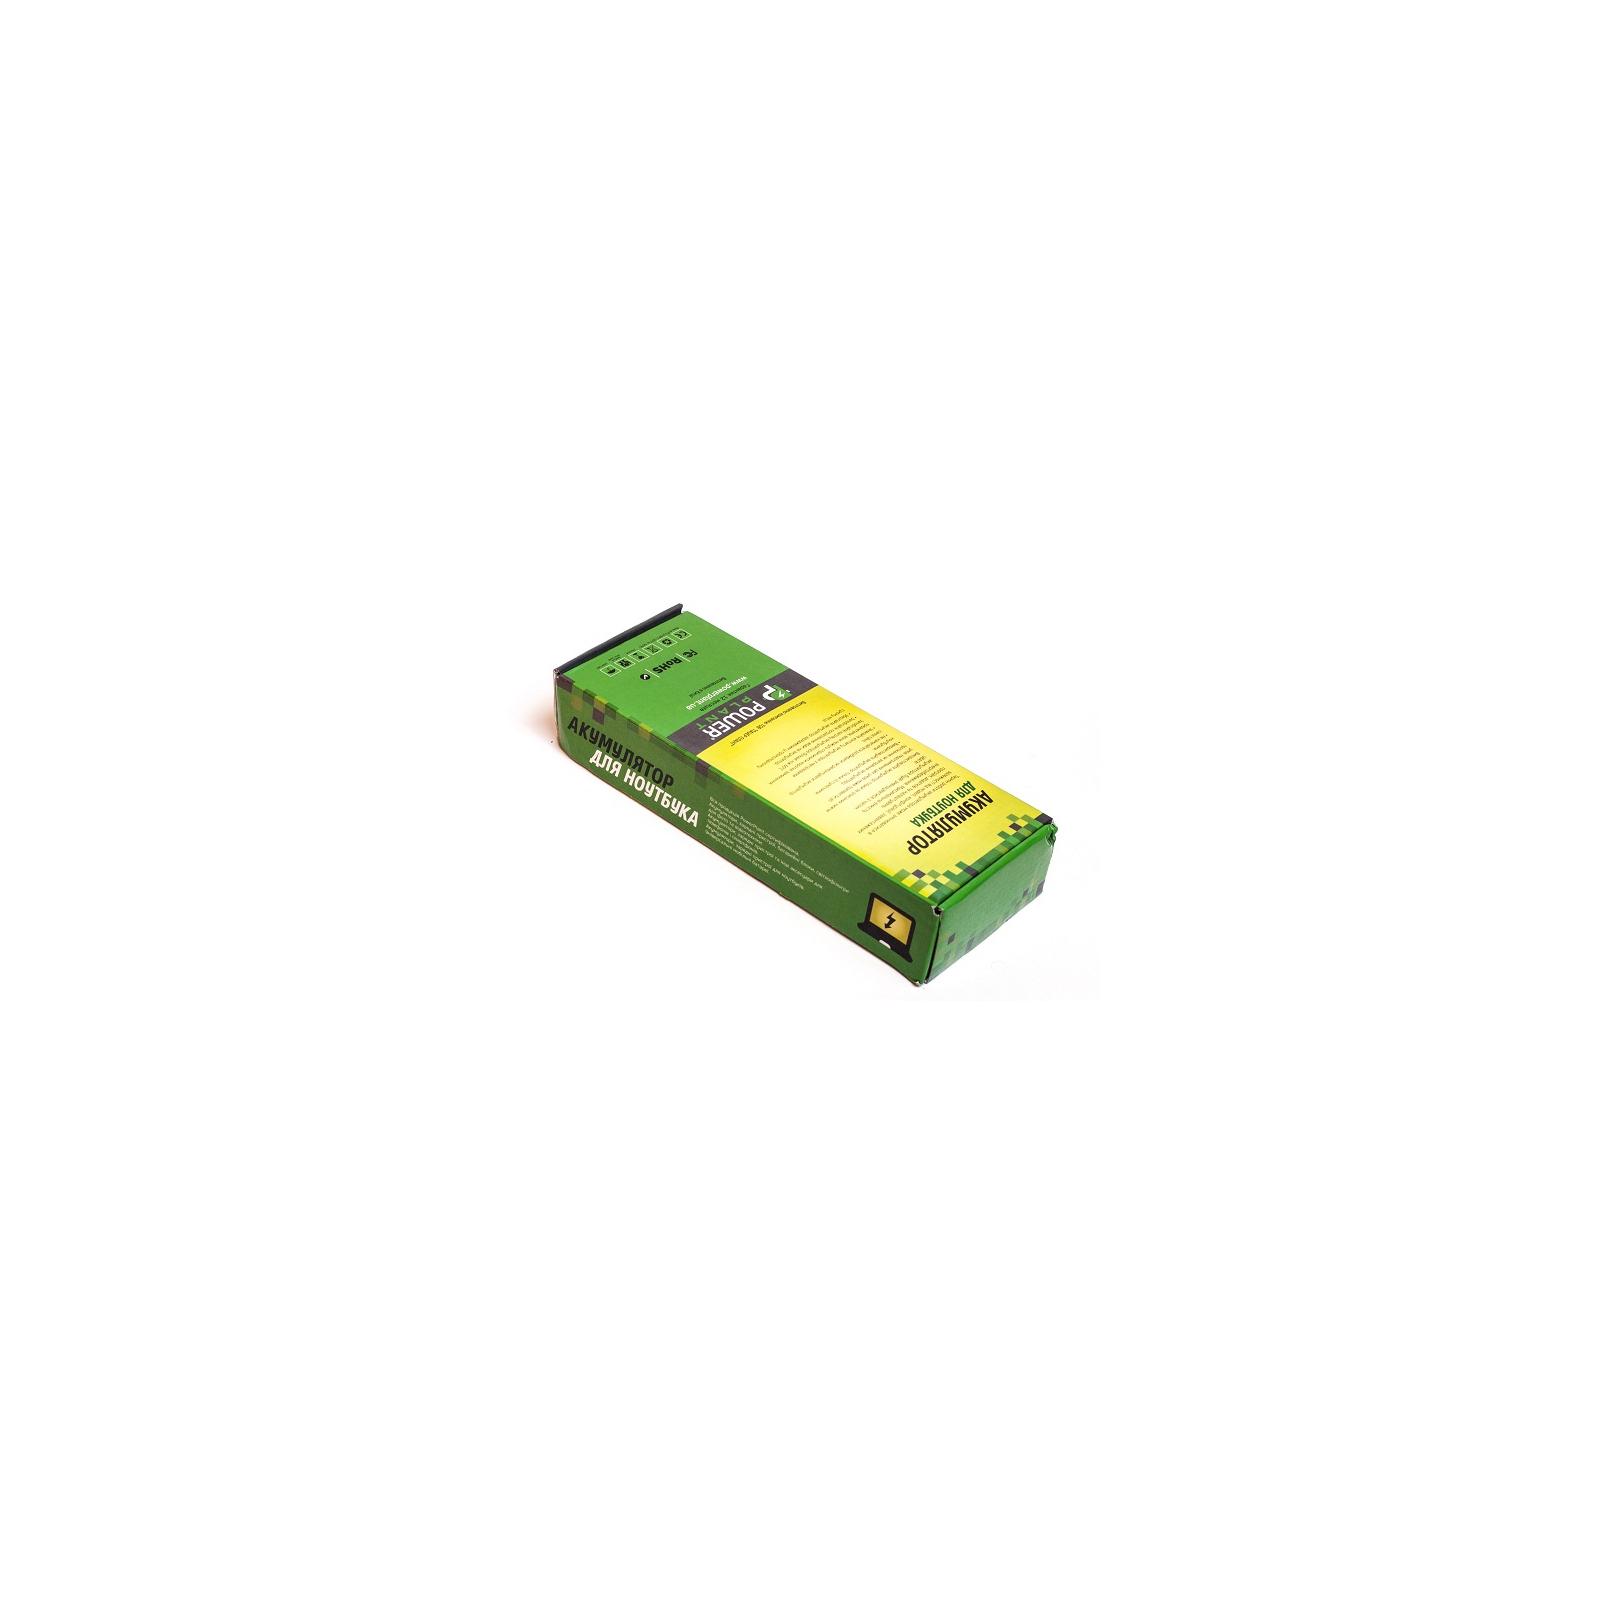 Аккумулятор для ноутбука HP 420 (587706-121, H4320LH) 10.8V 4400mAh PowerPlant (NB00000290) изображение 2